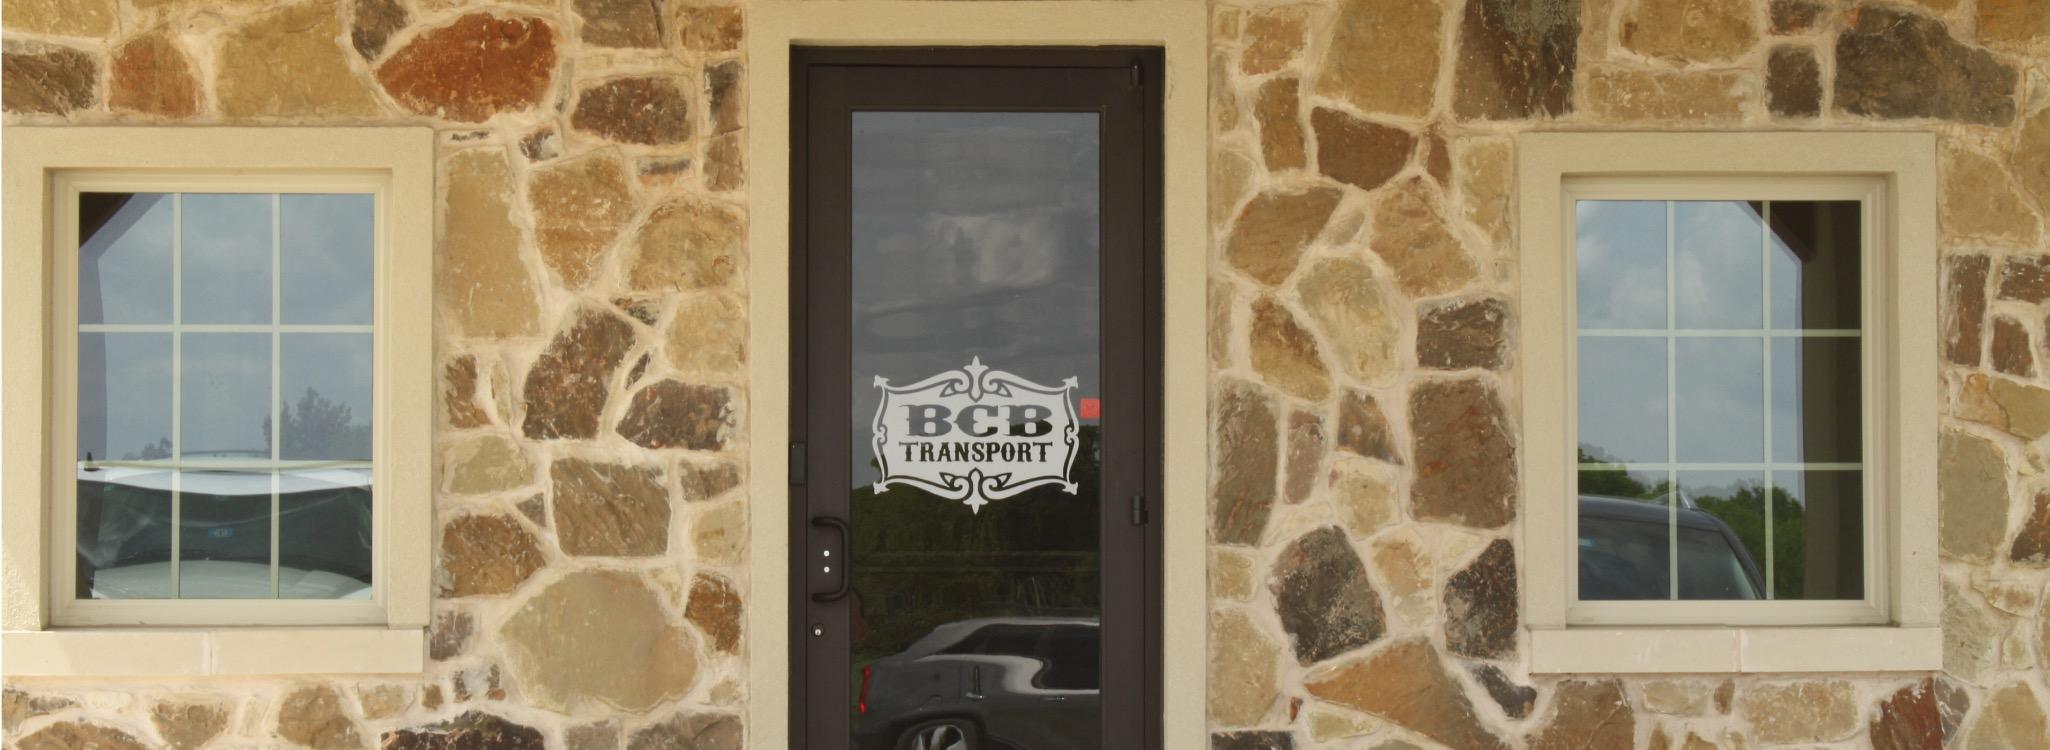 BCB Transport Industrial Construction Front Door